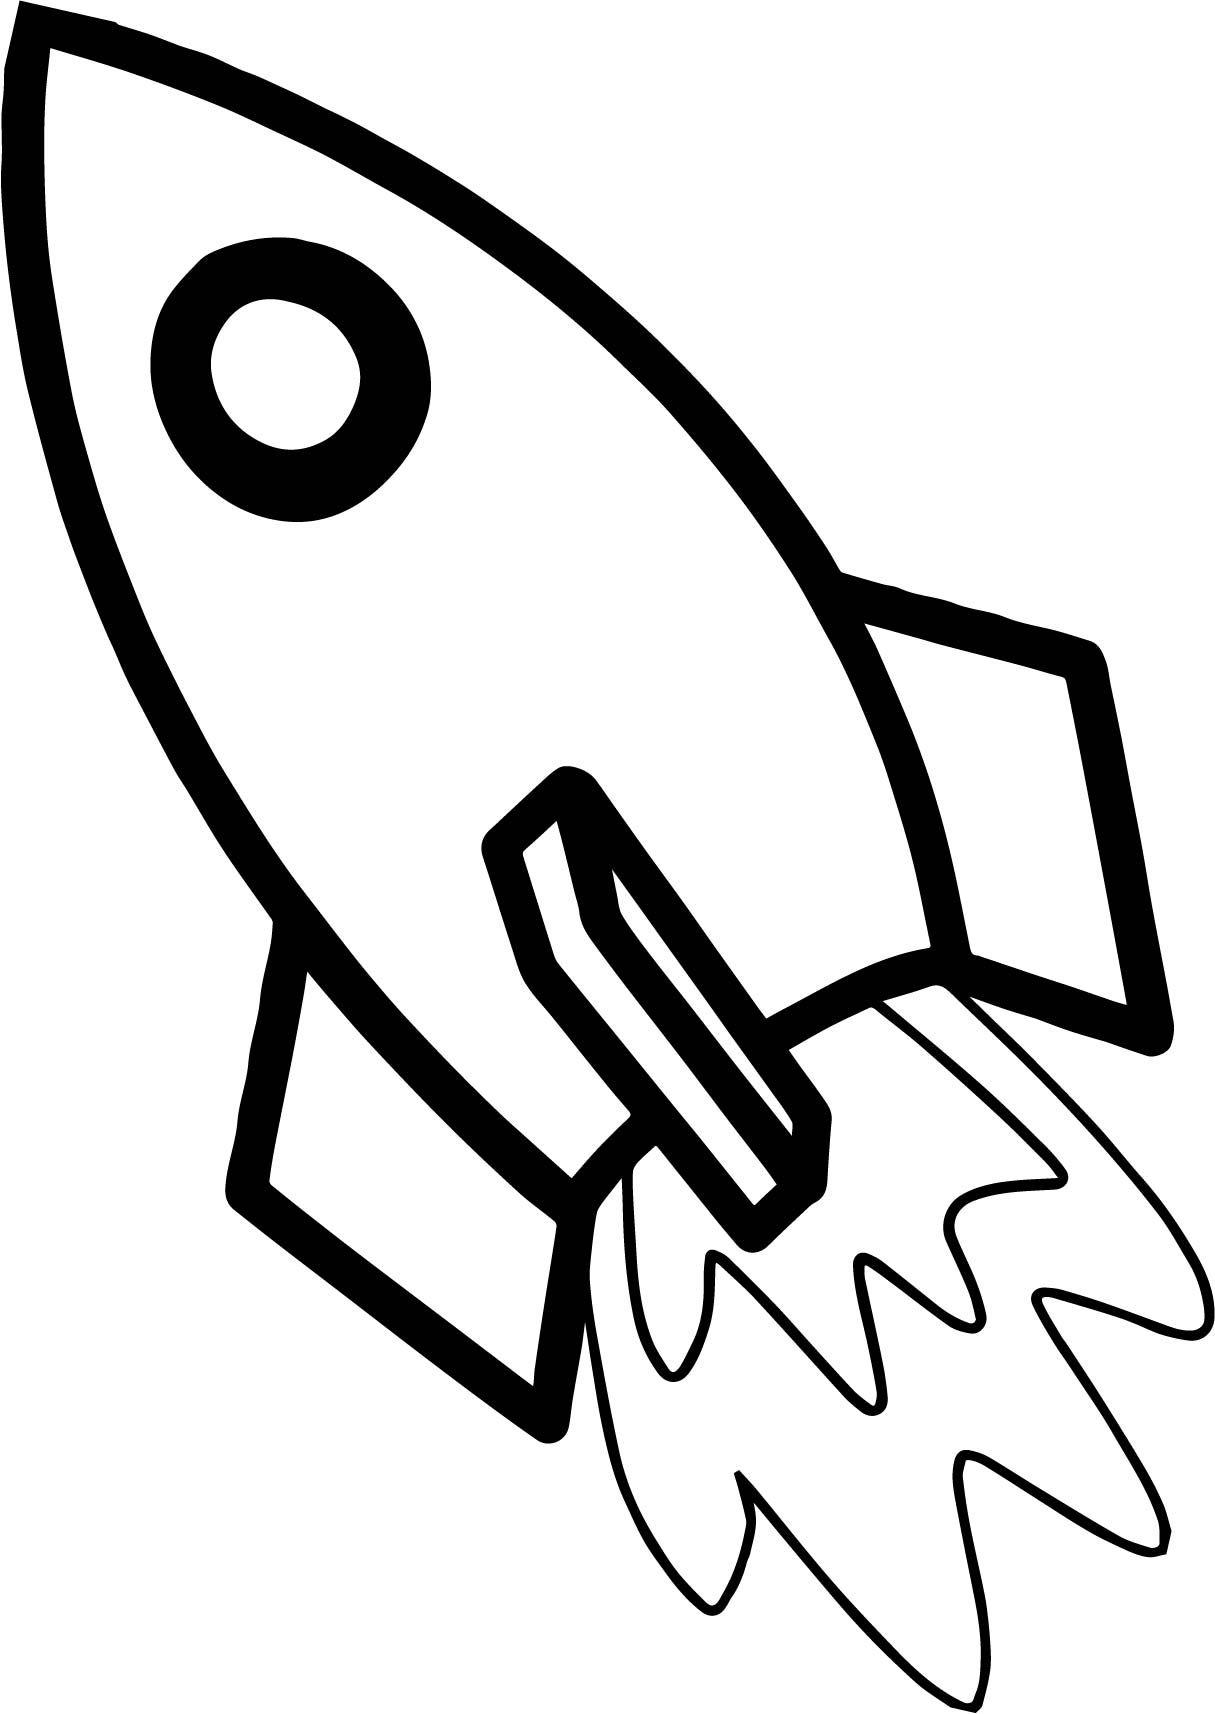 Astronaut Rocket Coloring Page